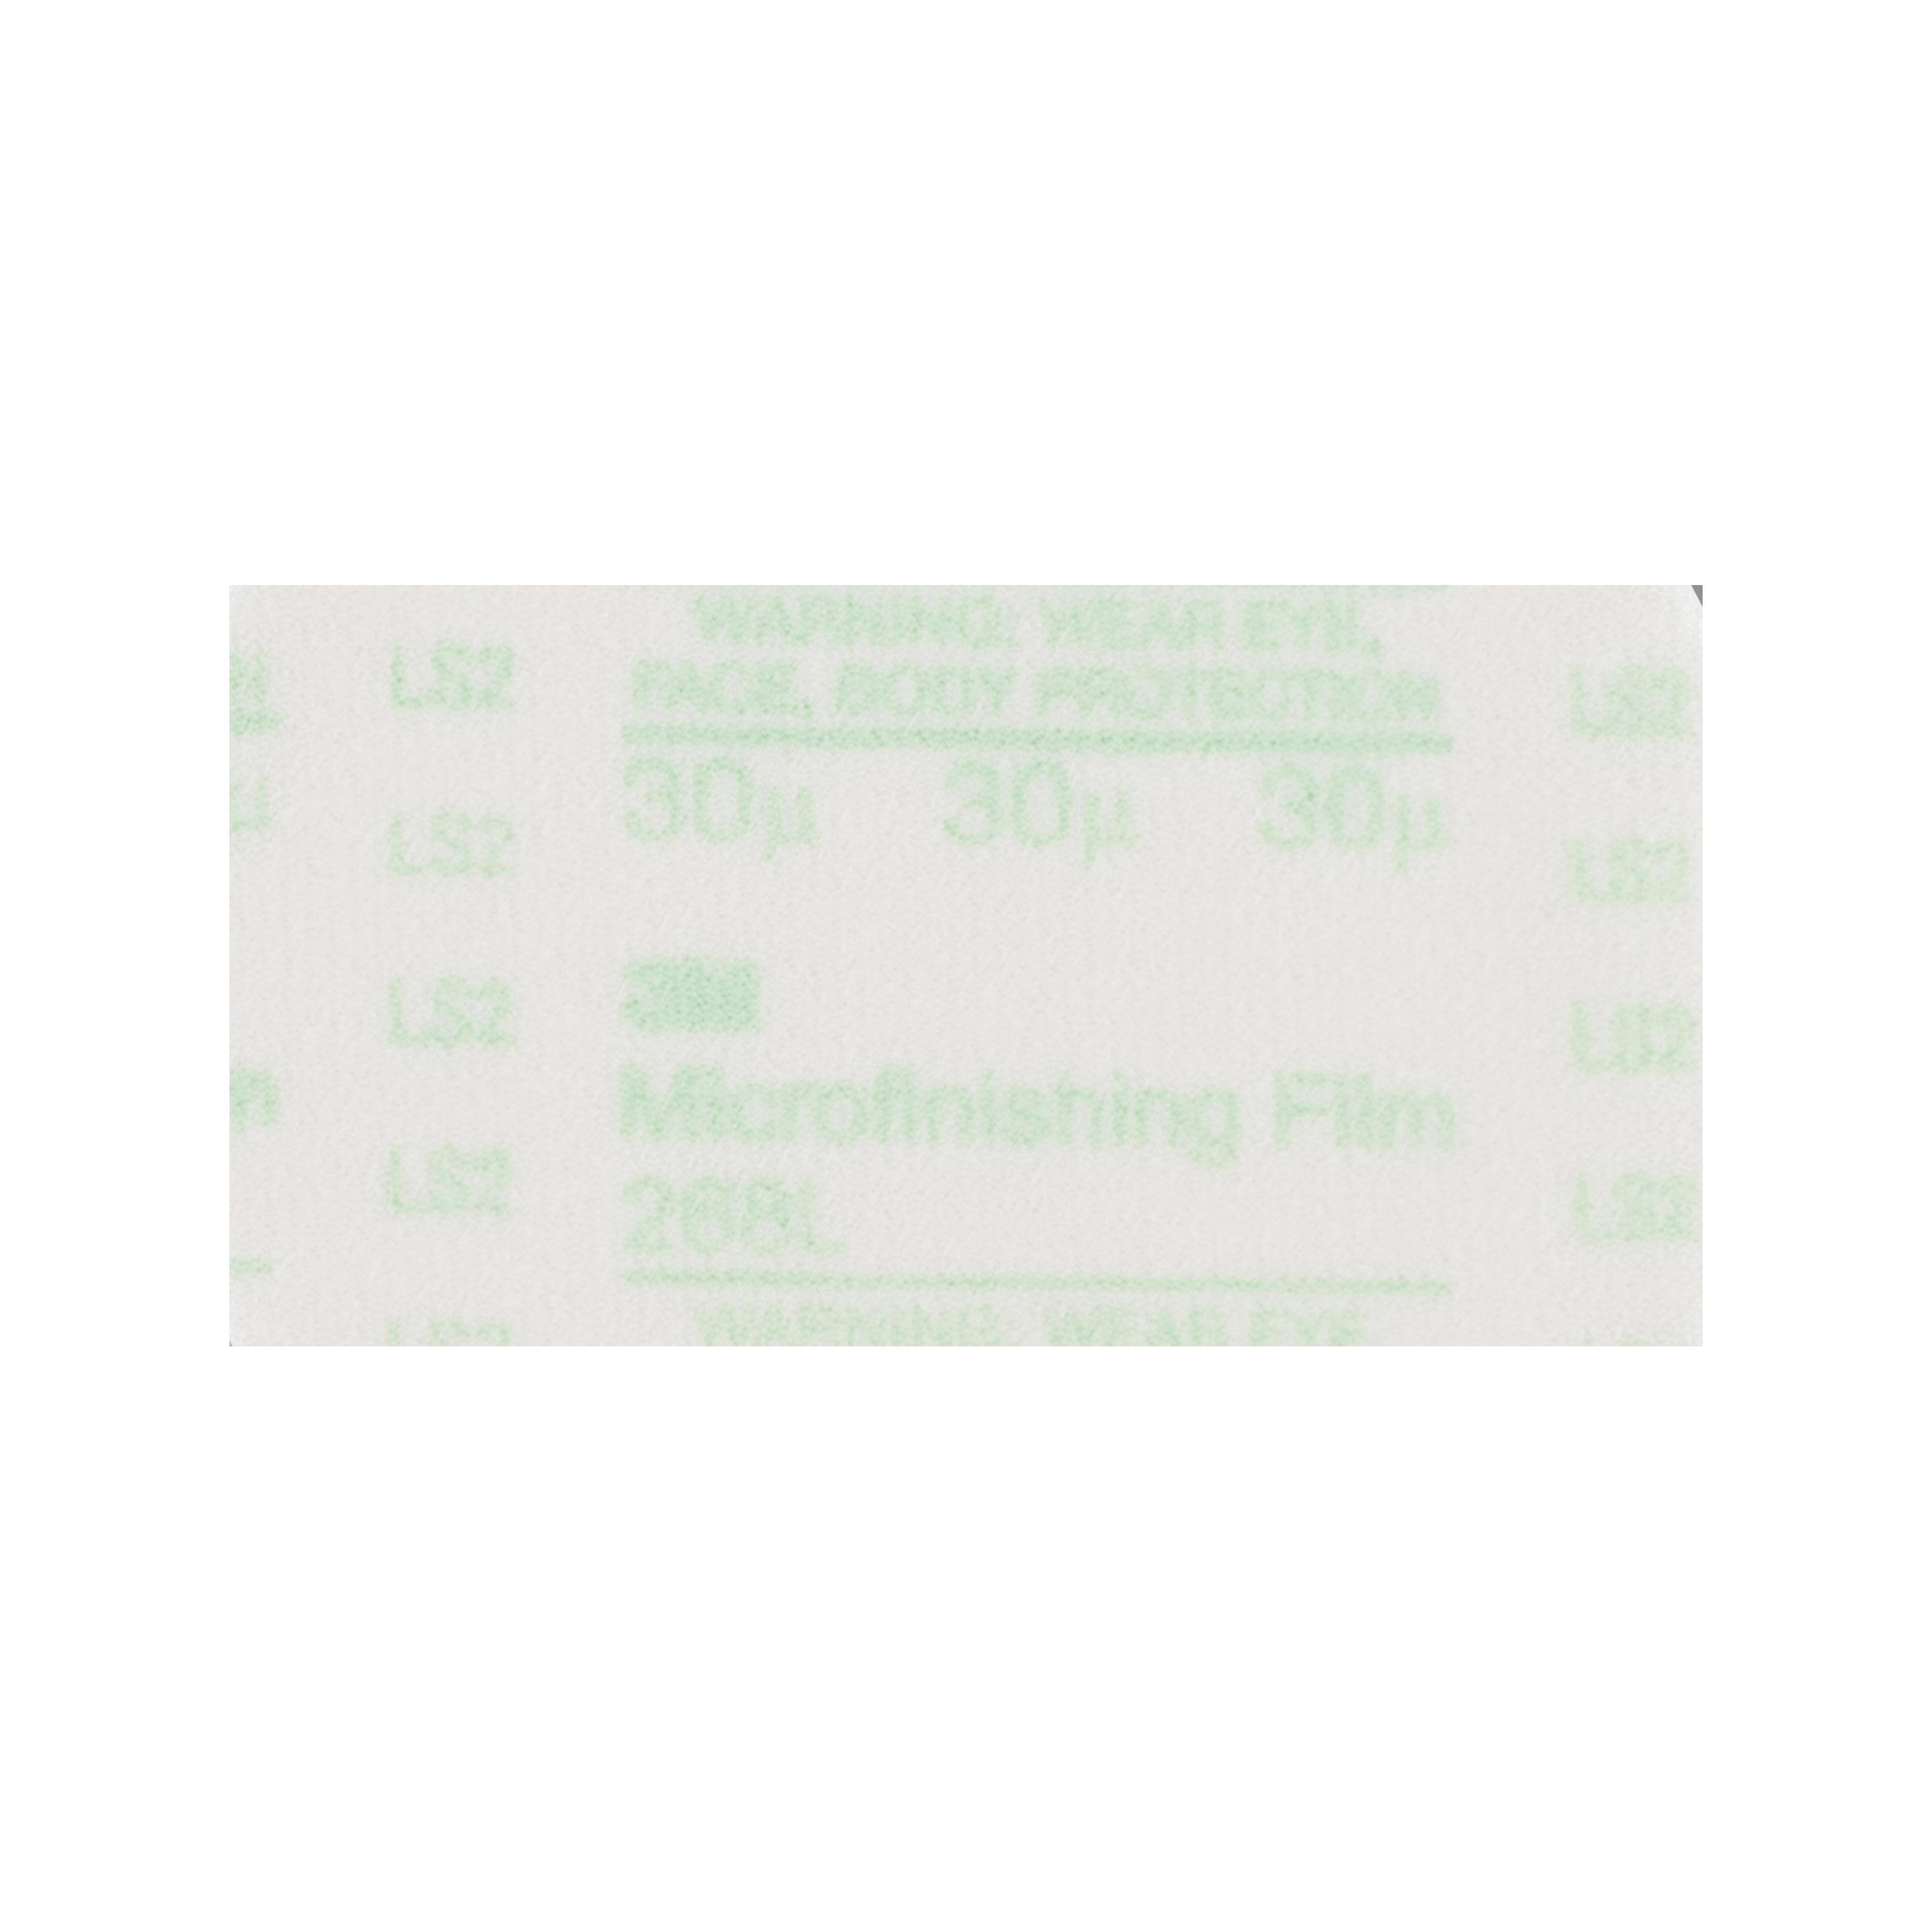 3M™ Hookit™ 051111-49999 268L Type D PSA Microfinishing Sheet, 11 in L x 8-1/2 in W, 60 micron Grit, Fine Grade, Aluminum Oxide Abrasive, 3 mil Polyester Film Backing